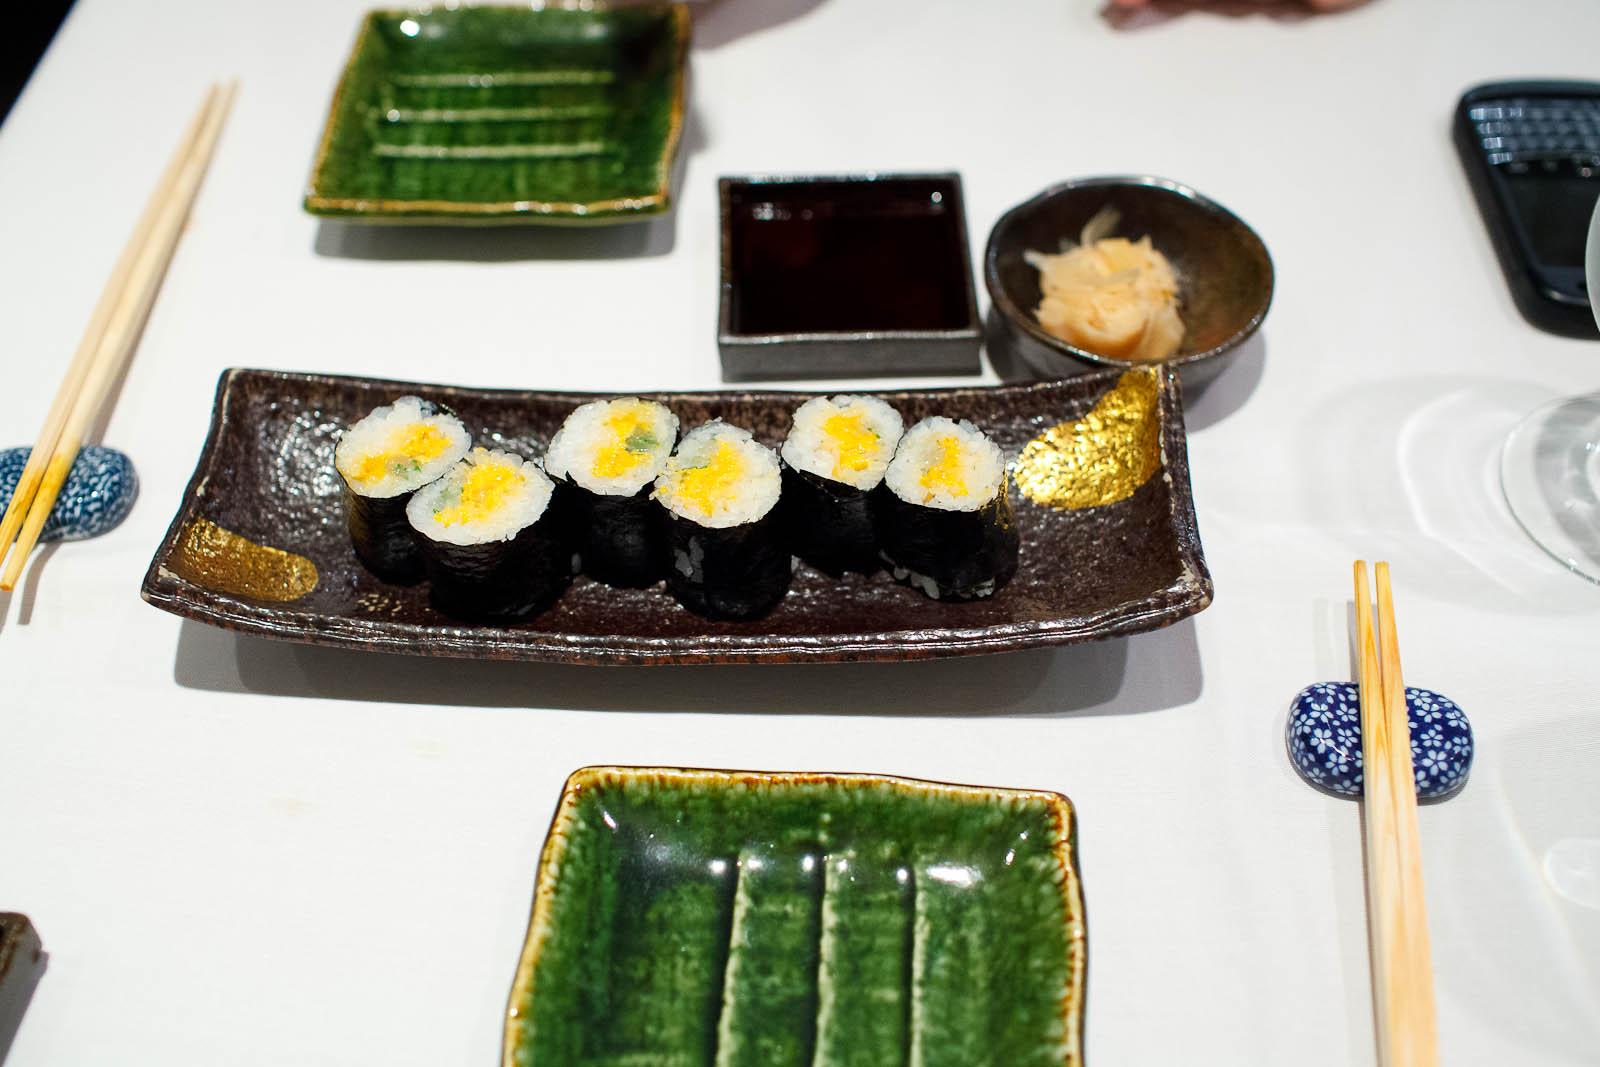 Uni and ika roll ($12)